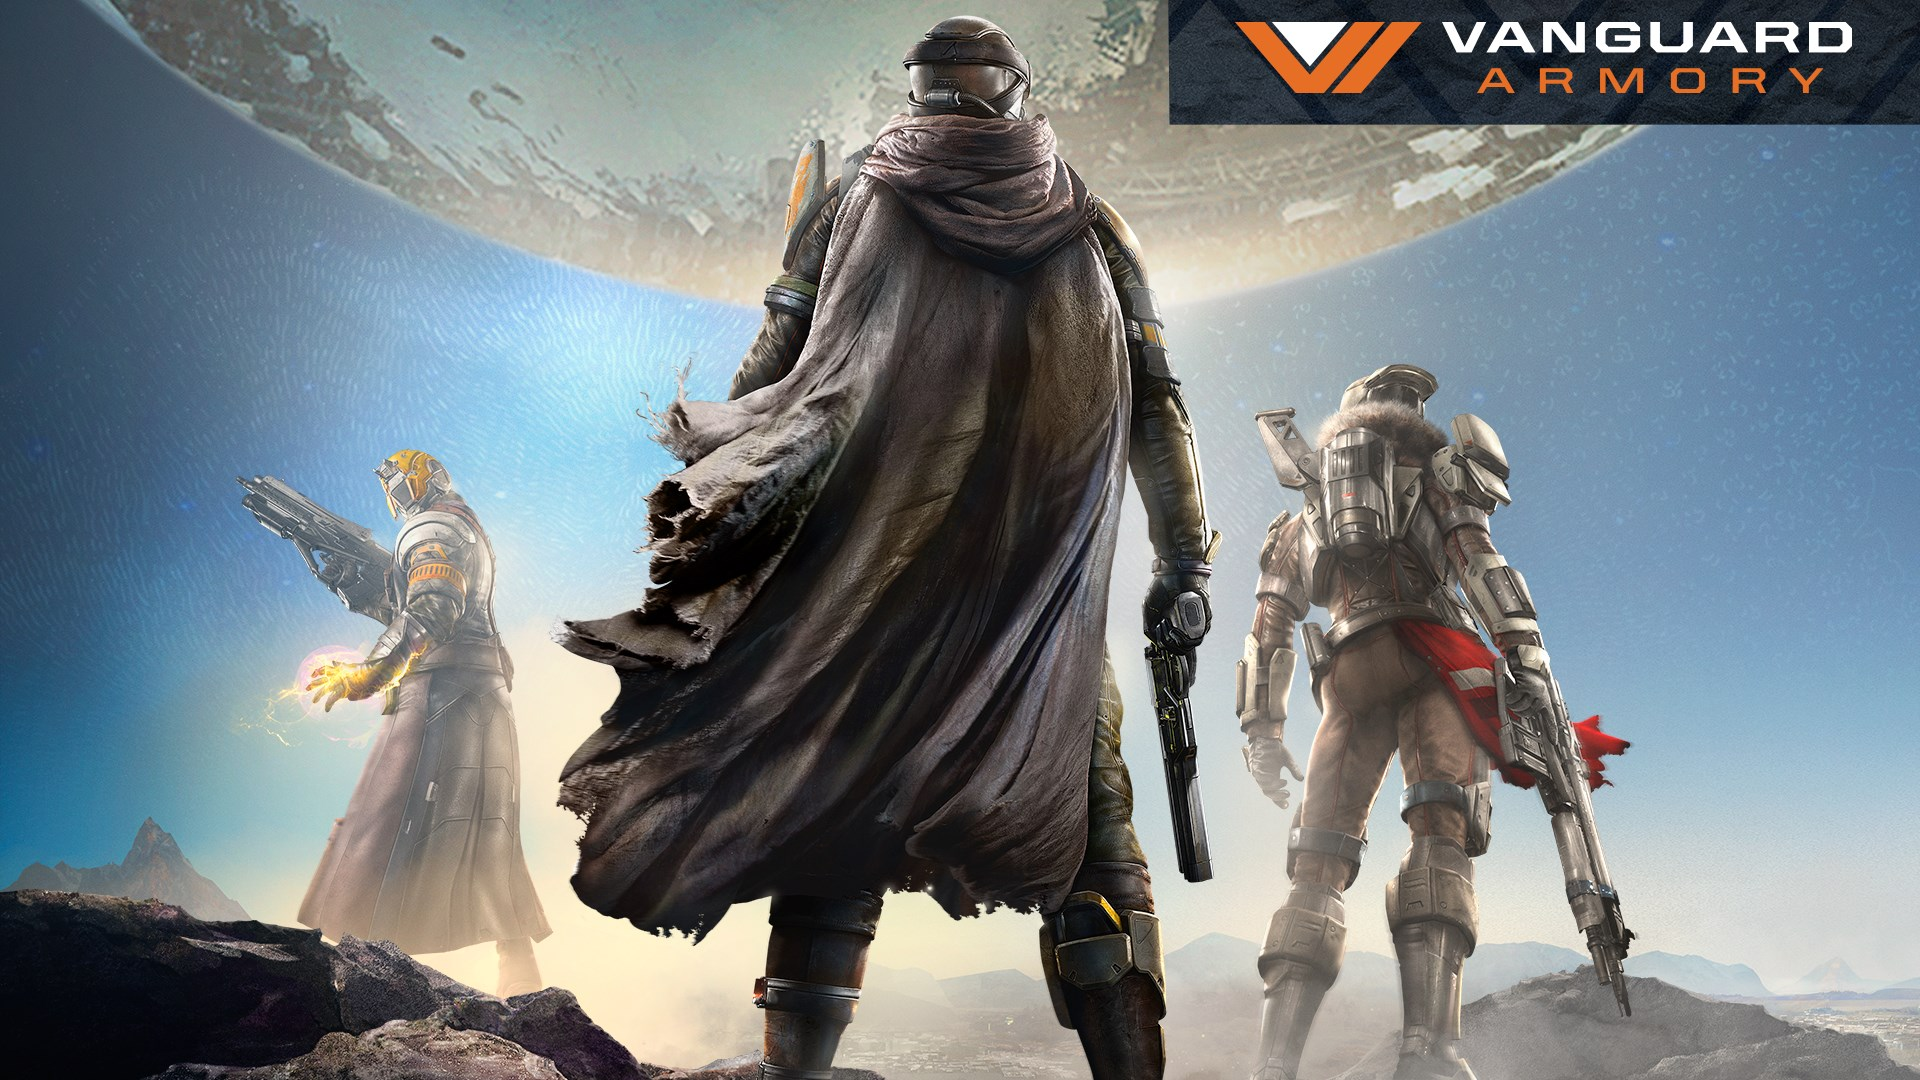 Vanguard Armory